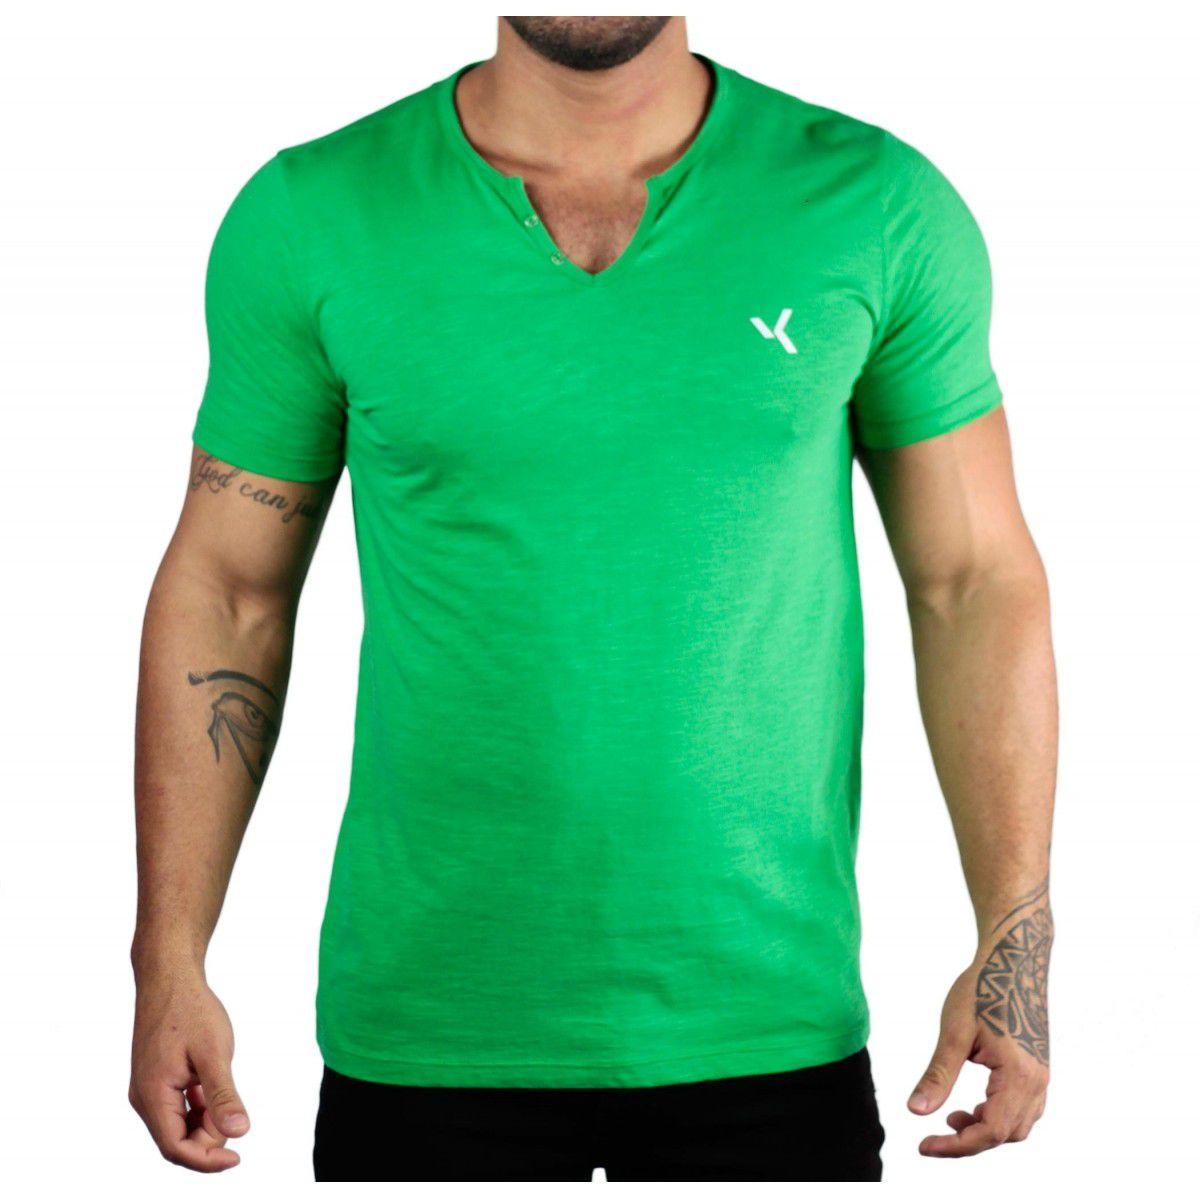 84ea5dcb2d Camiseta Básica Flamê Gola Henley Verde - VK by VK